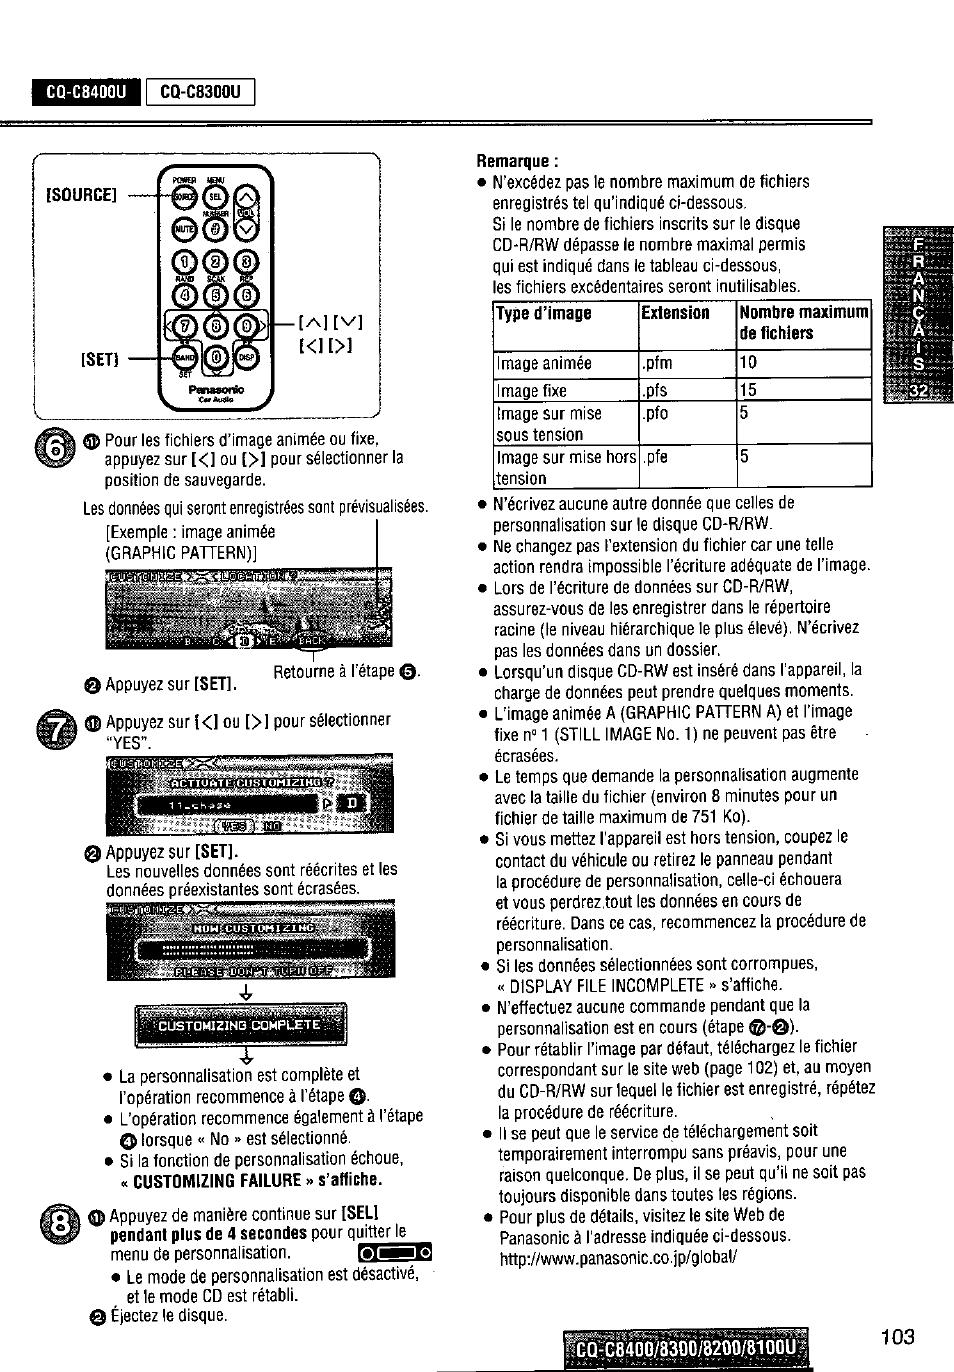 hight resolution of cq c8400u remarque p1 e panasonic cq c8300u user manual